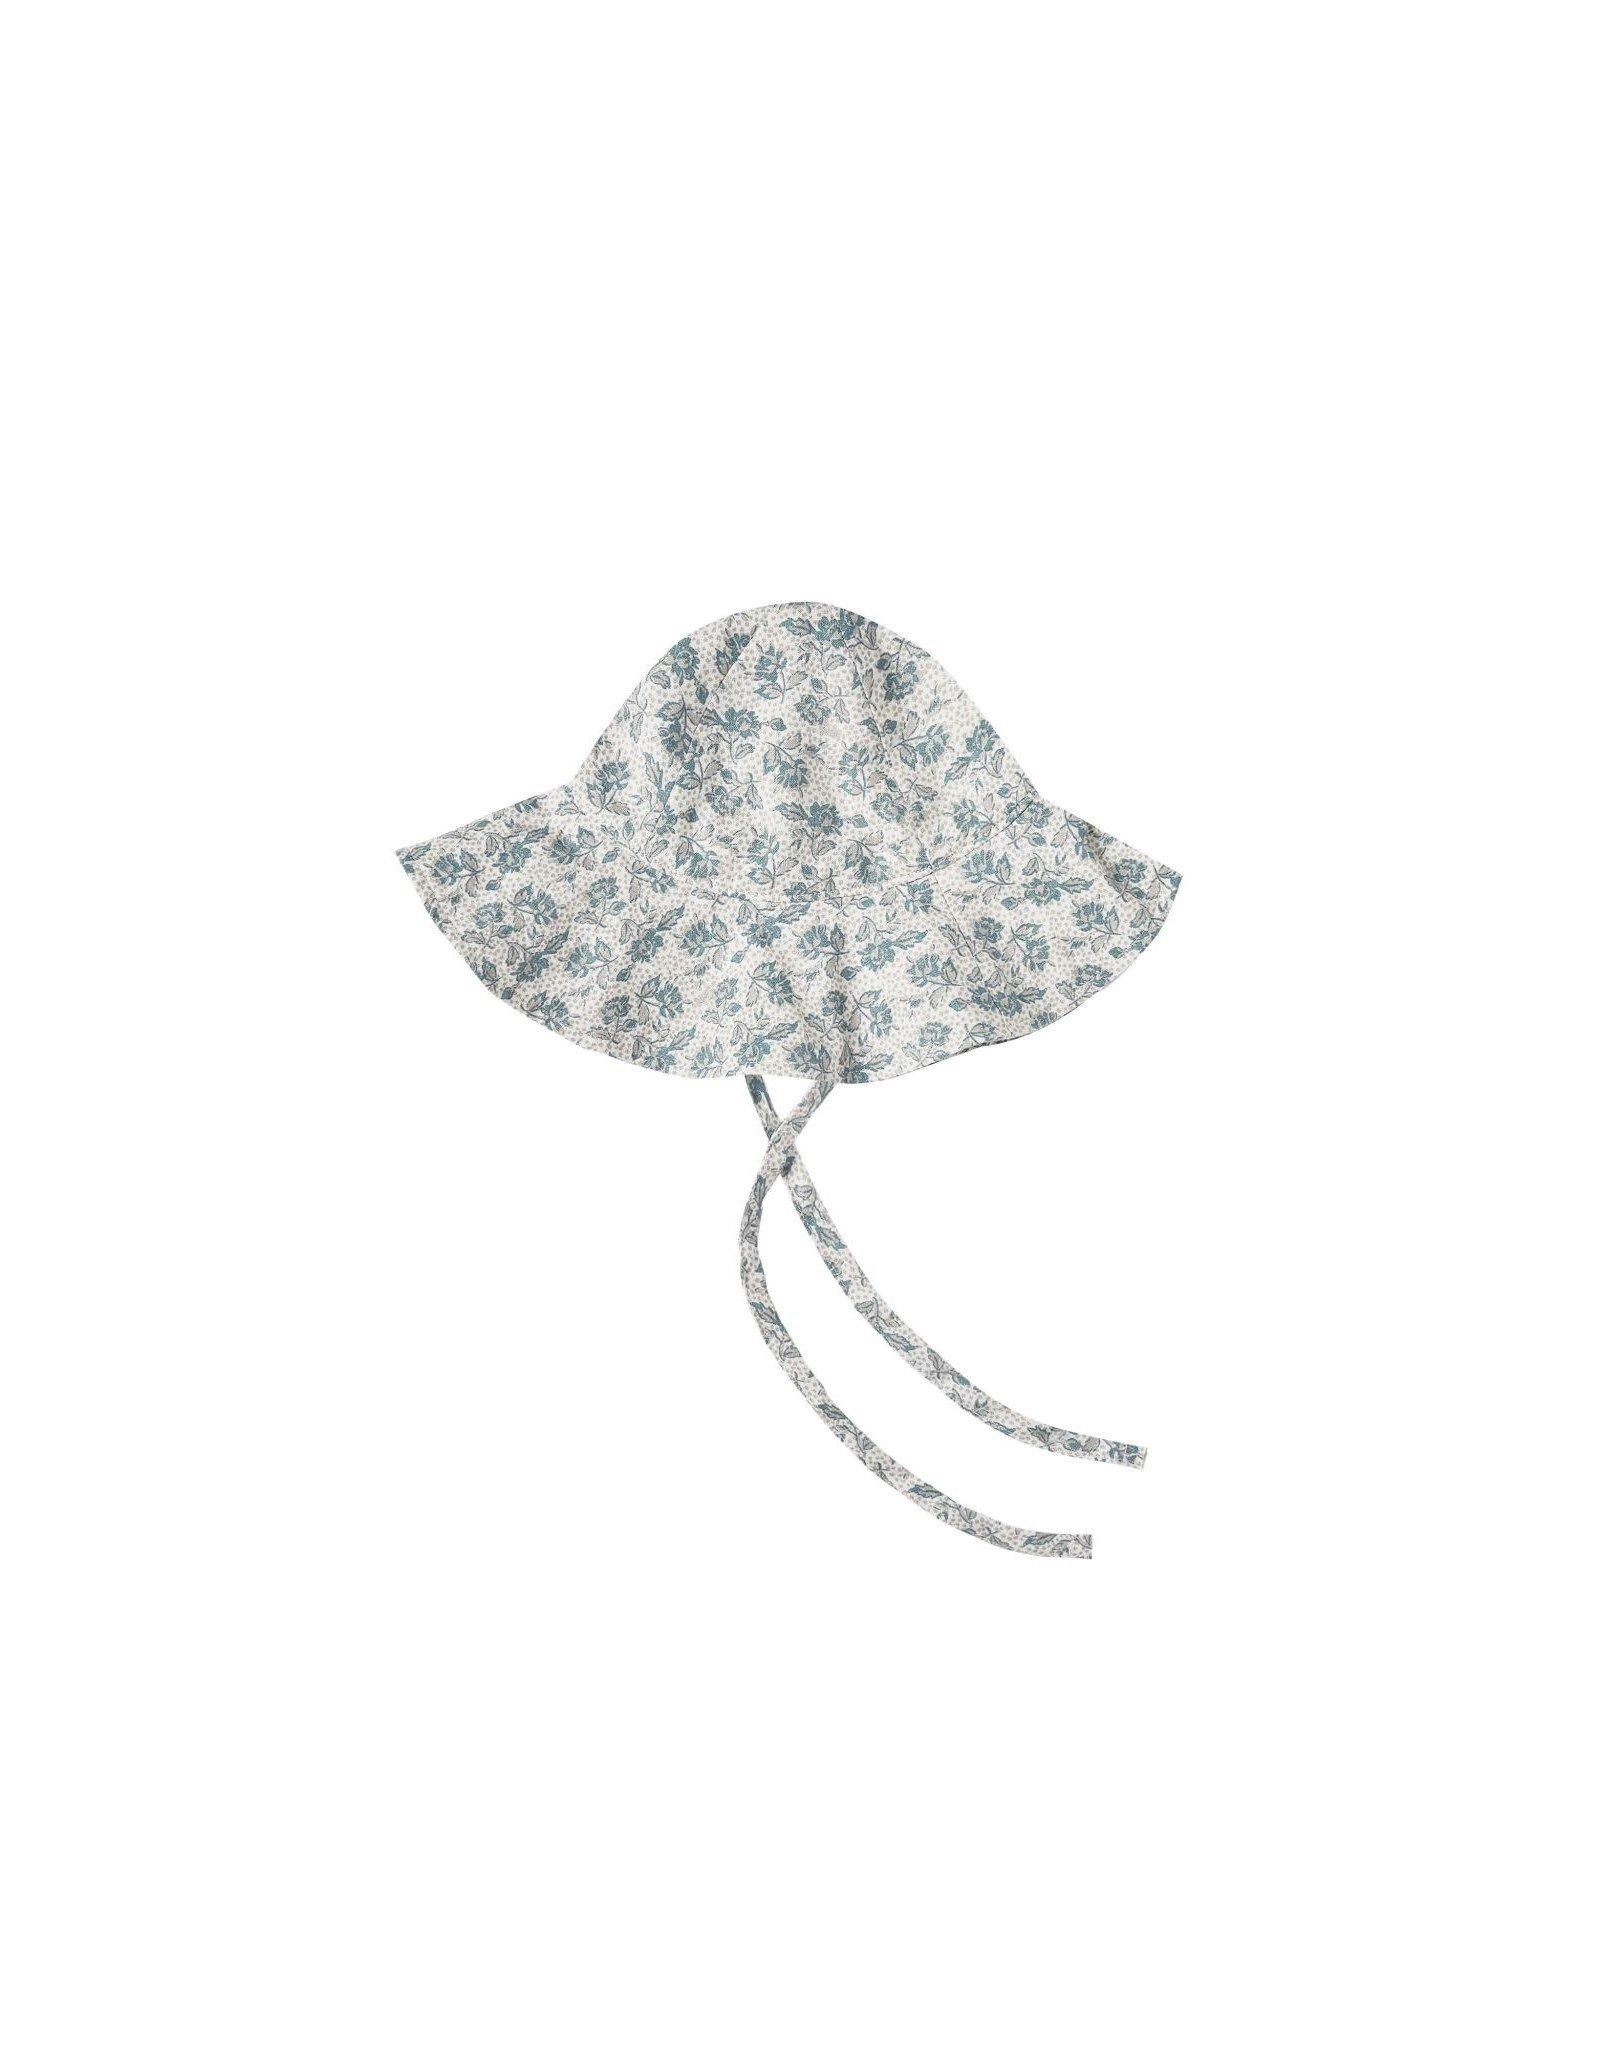 Rylee and Cru floppy sun hat- roses